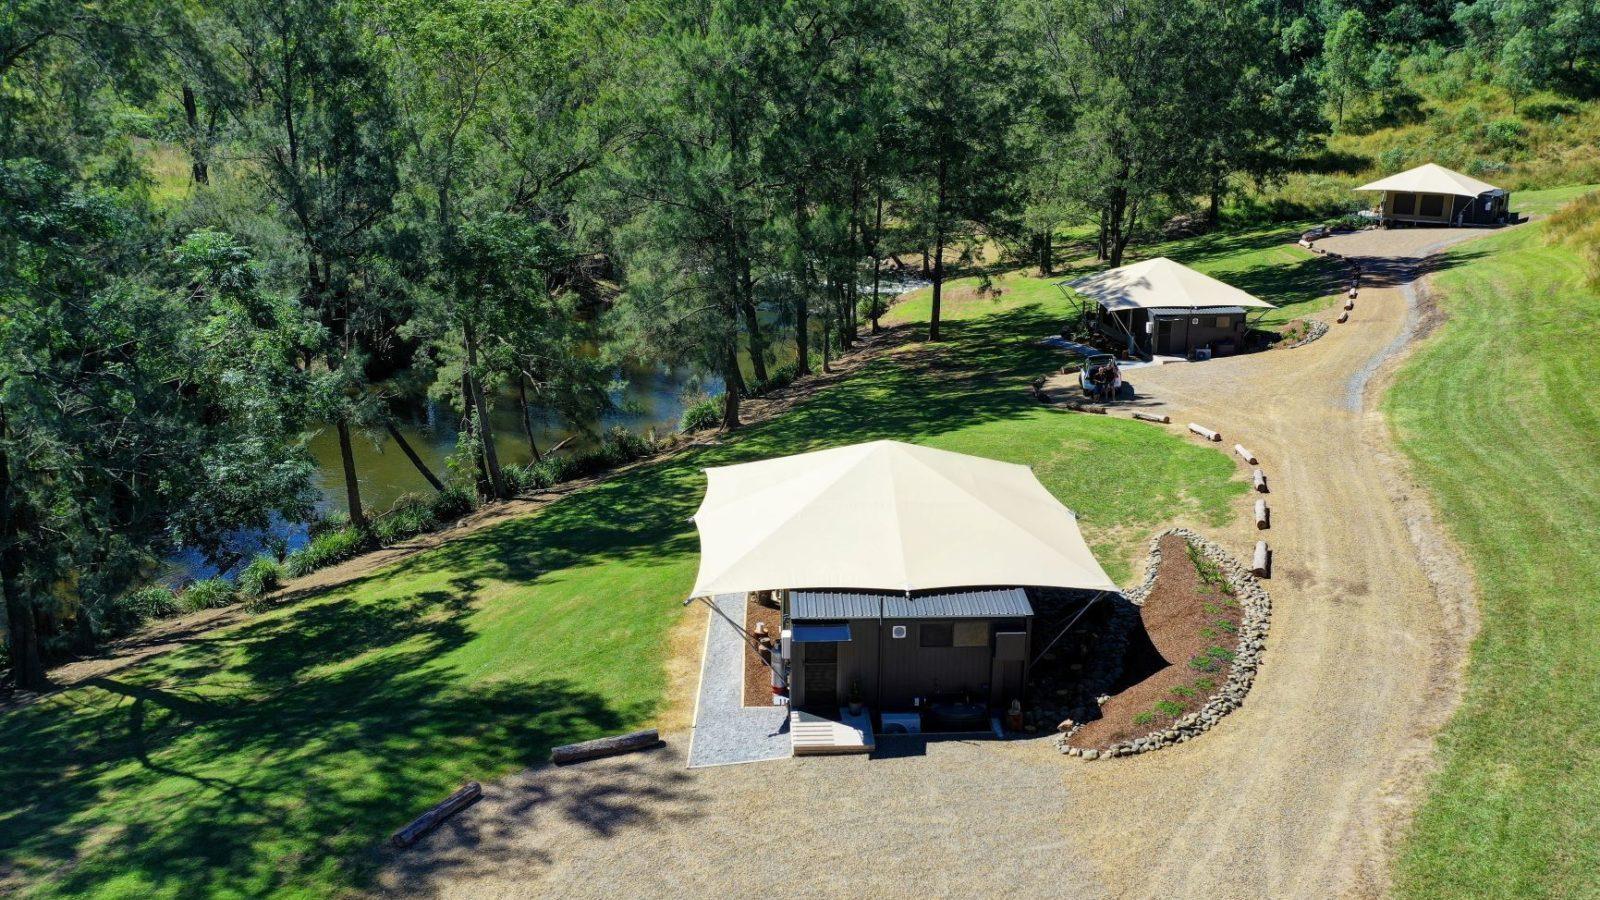 Amaroo Escape site view, hinterland accommodation